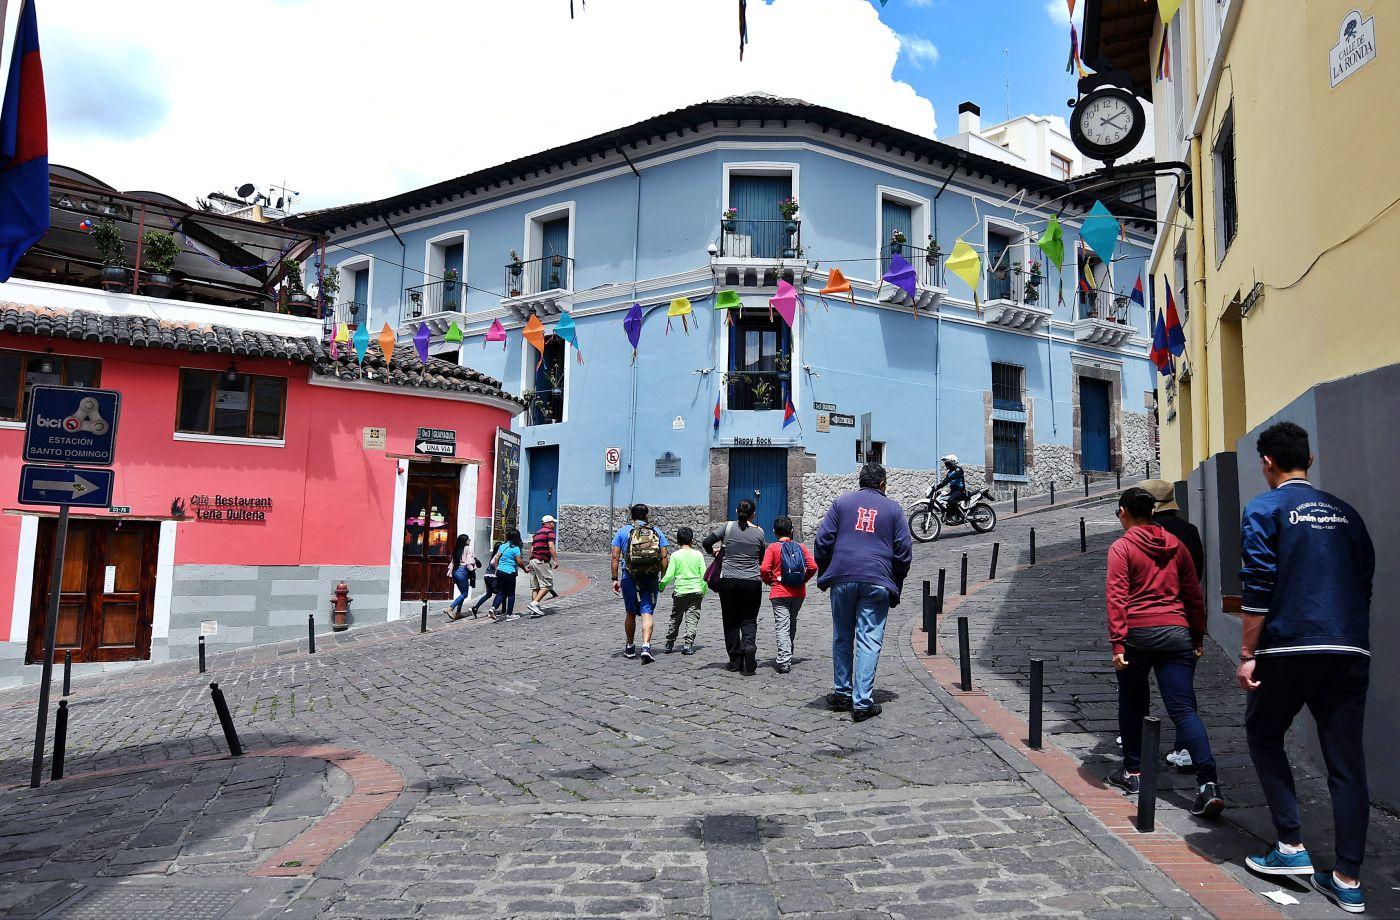 Españoles quieren a Quito para turistear